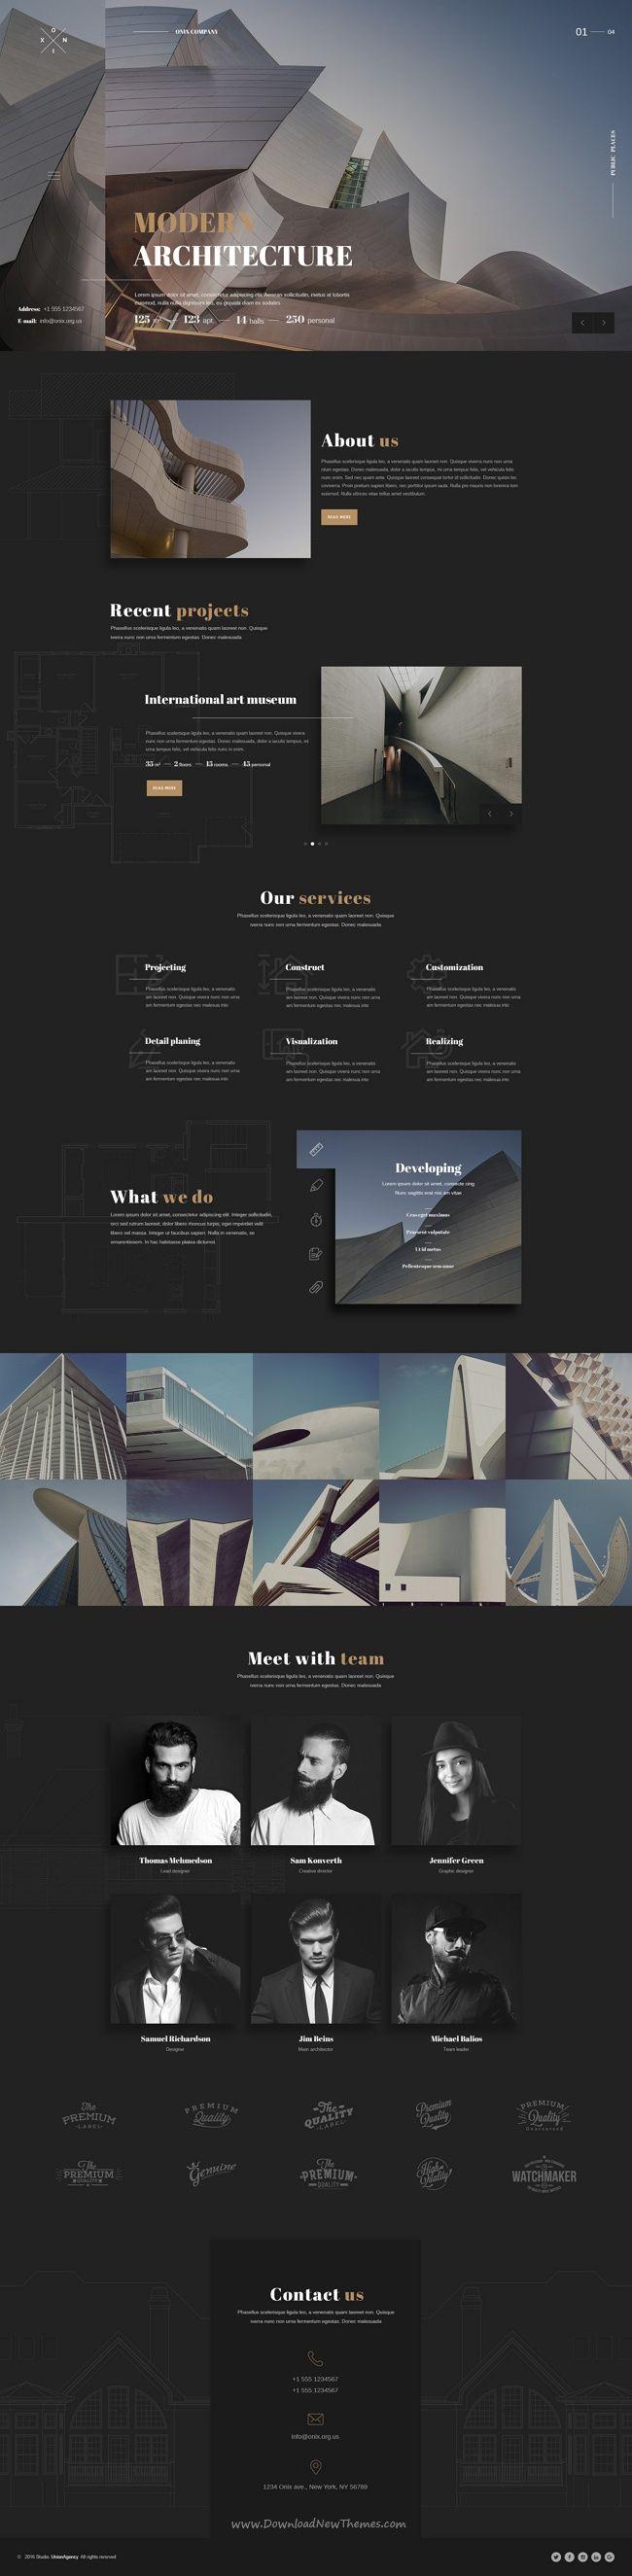 Onix is clean, modern & very creative #PSD template for #architect, #interior & portfolio website download now➩ https://themeforest.net/item/onix-multi-purpose-architecture-interior-portfolio-psd-template/19260898?ref=Datasata